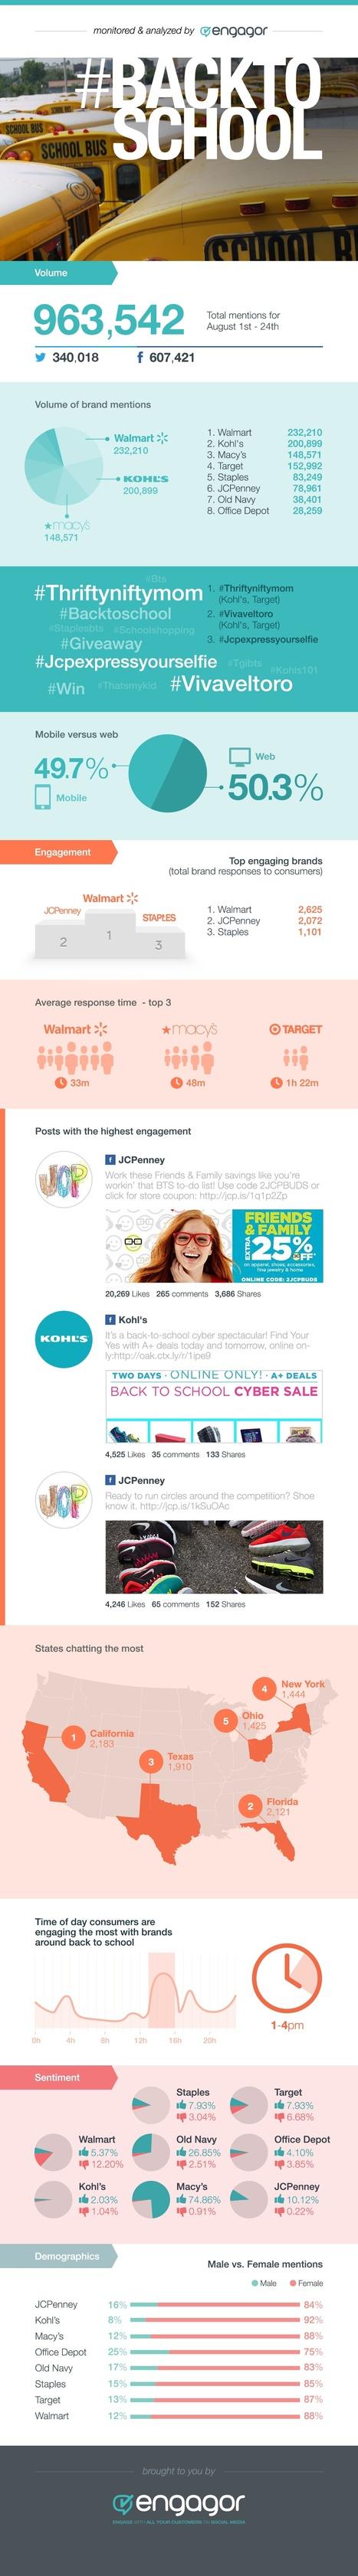 Walmart Dominates Social Media #BackToSchool Chatter [INFOGRAPHIC] | MarketingHits | Scoop.it